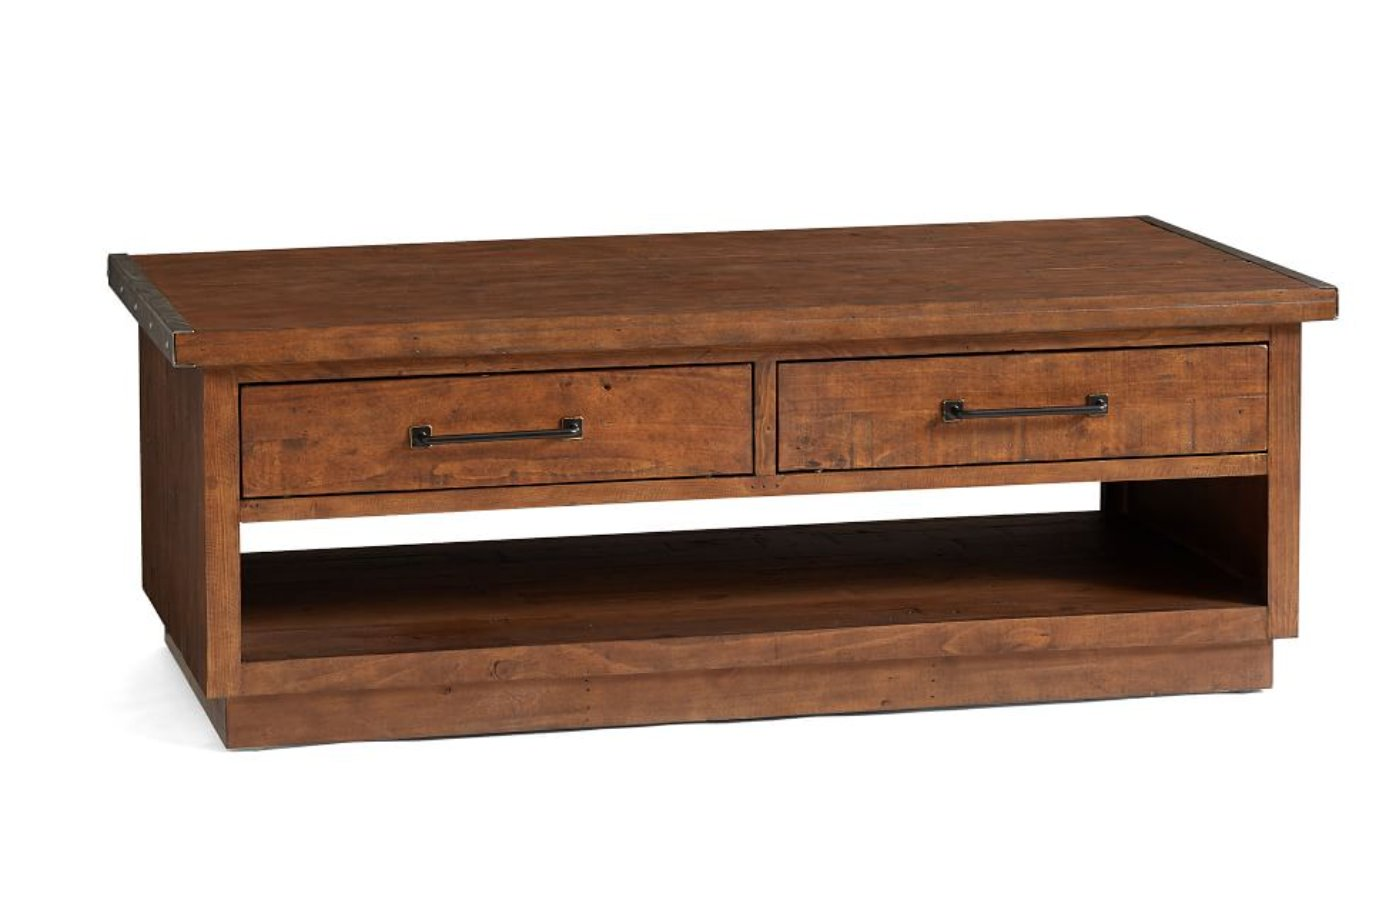 "Novato Reclaimed Wood Rectangular 54"" Coffee Table, Light Carbon"